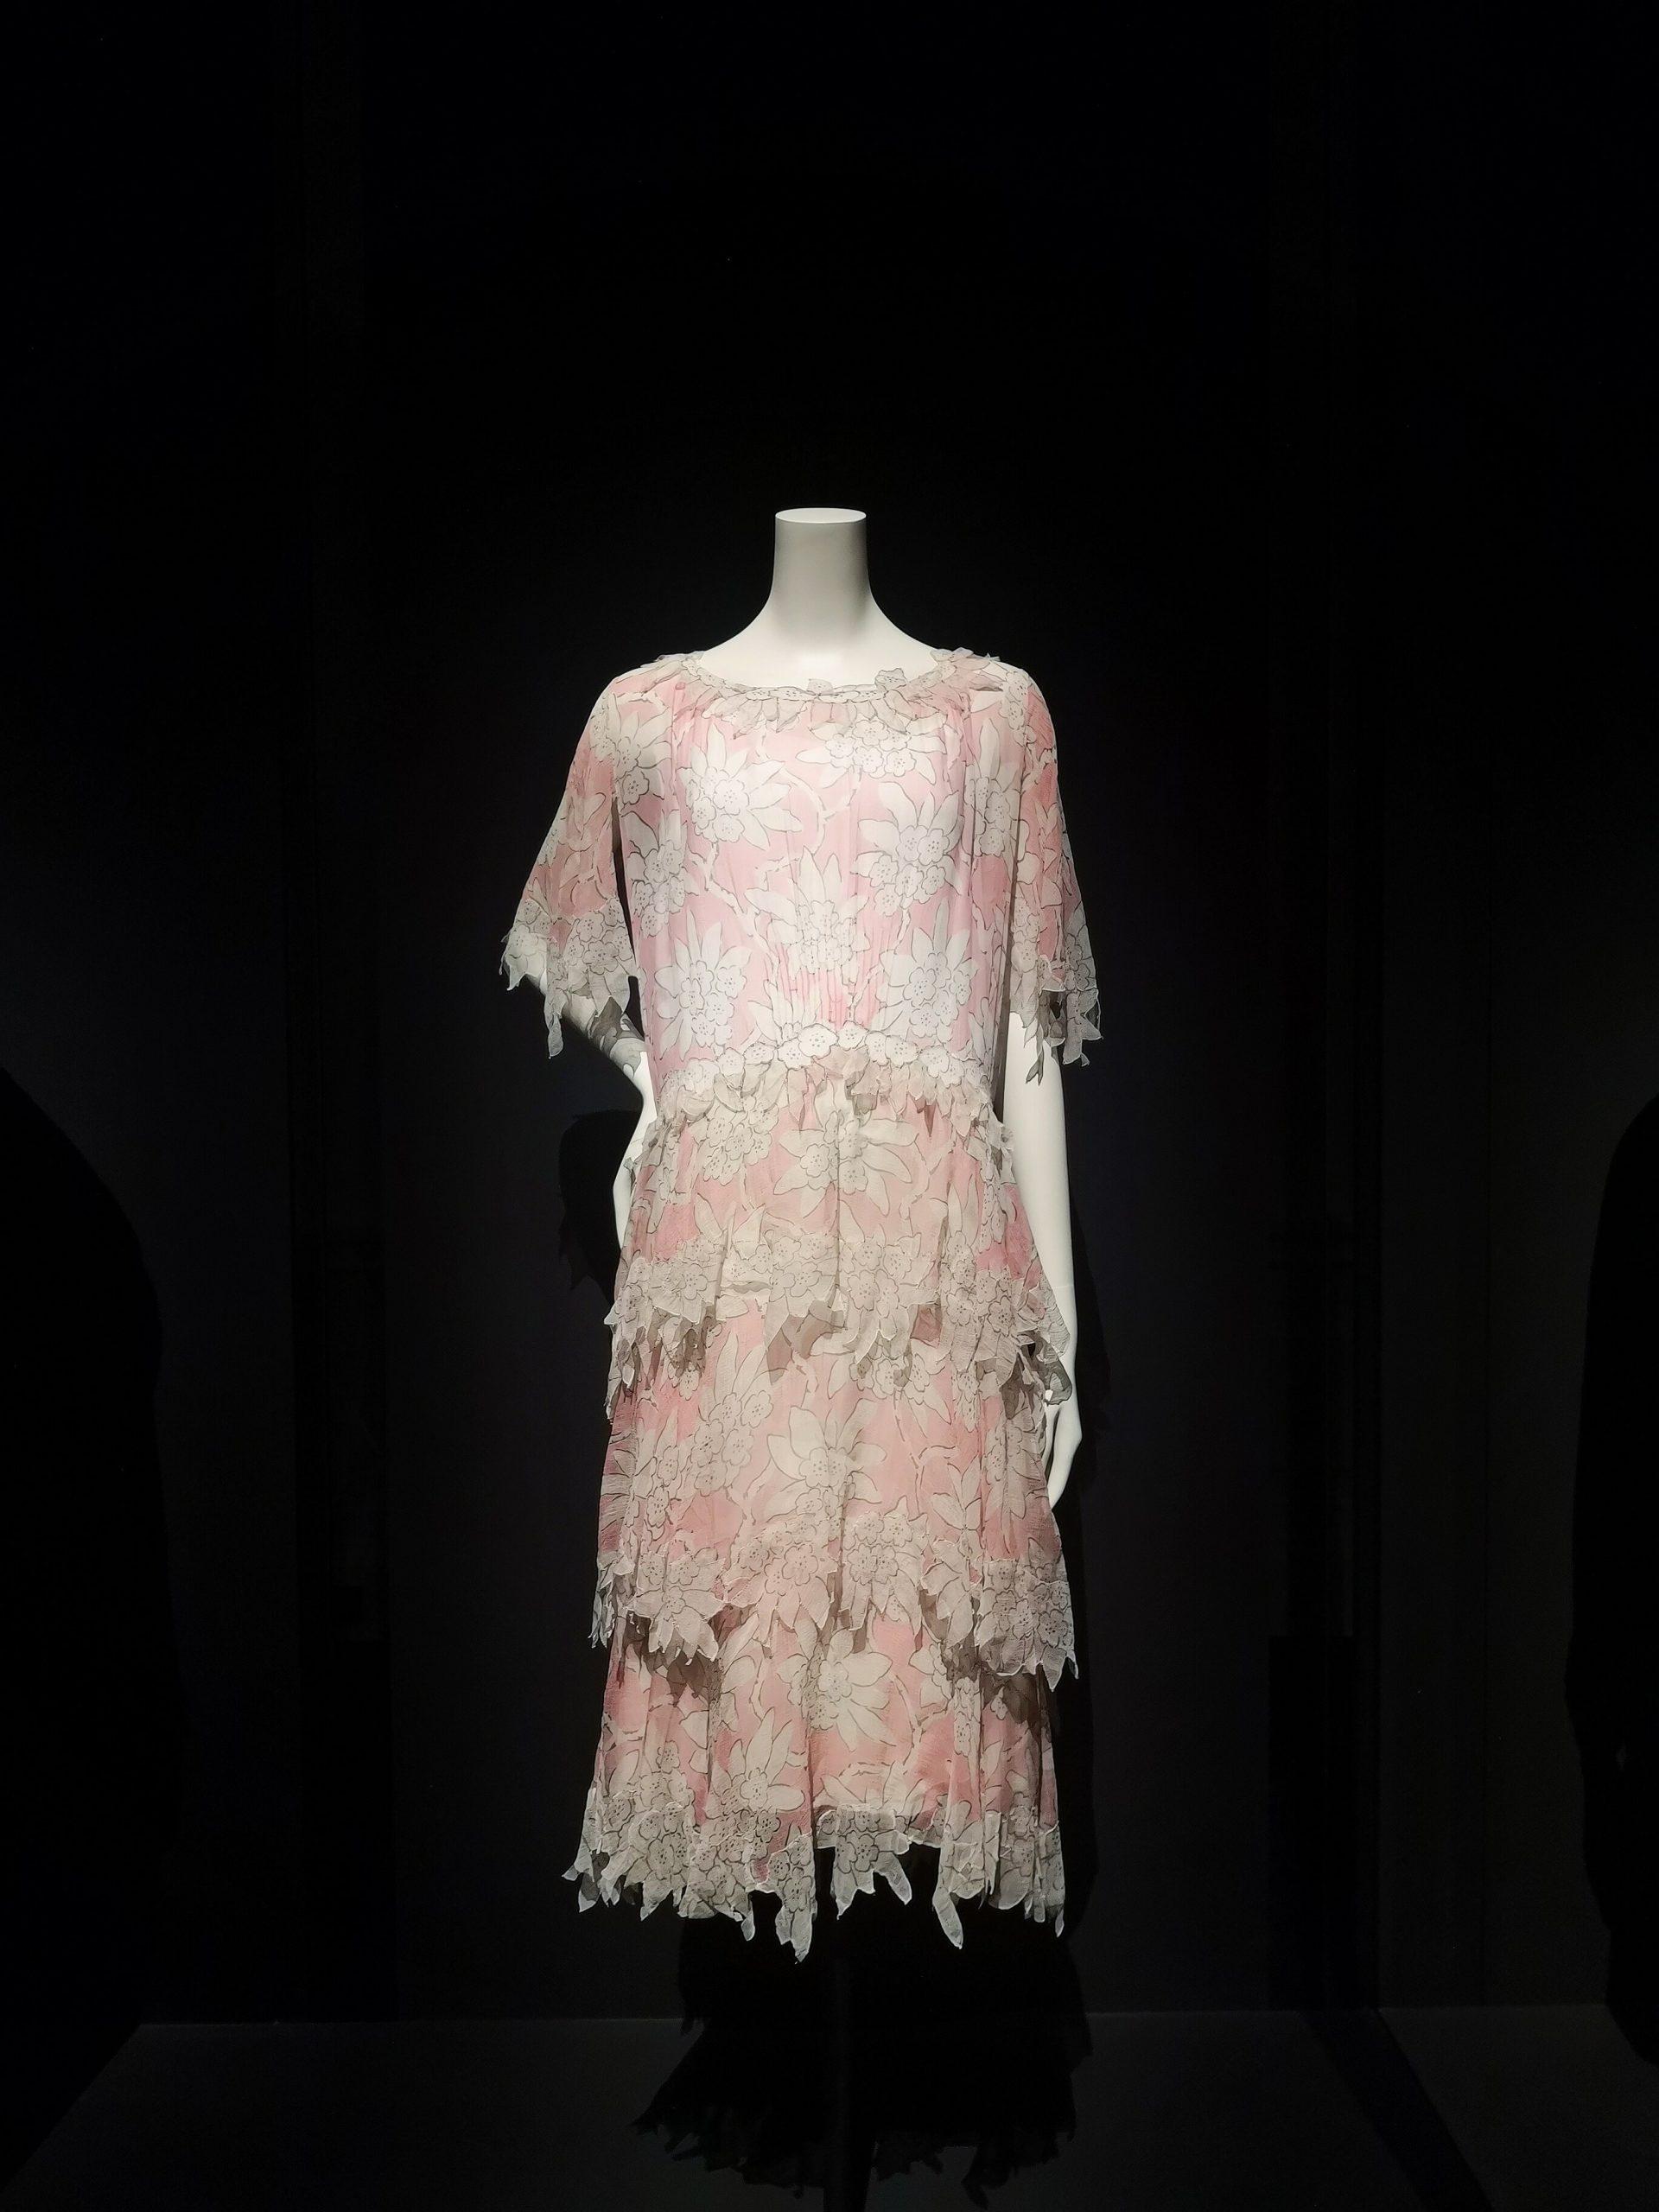 Afternoon dress / 1930 / Paris, Palais Galliera / Gift from Madame Bertin